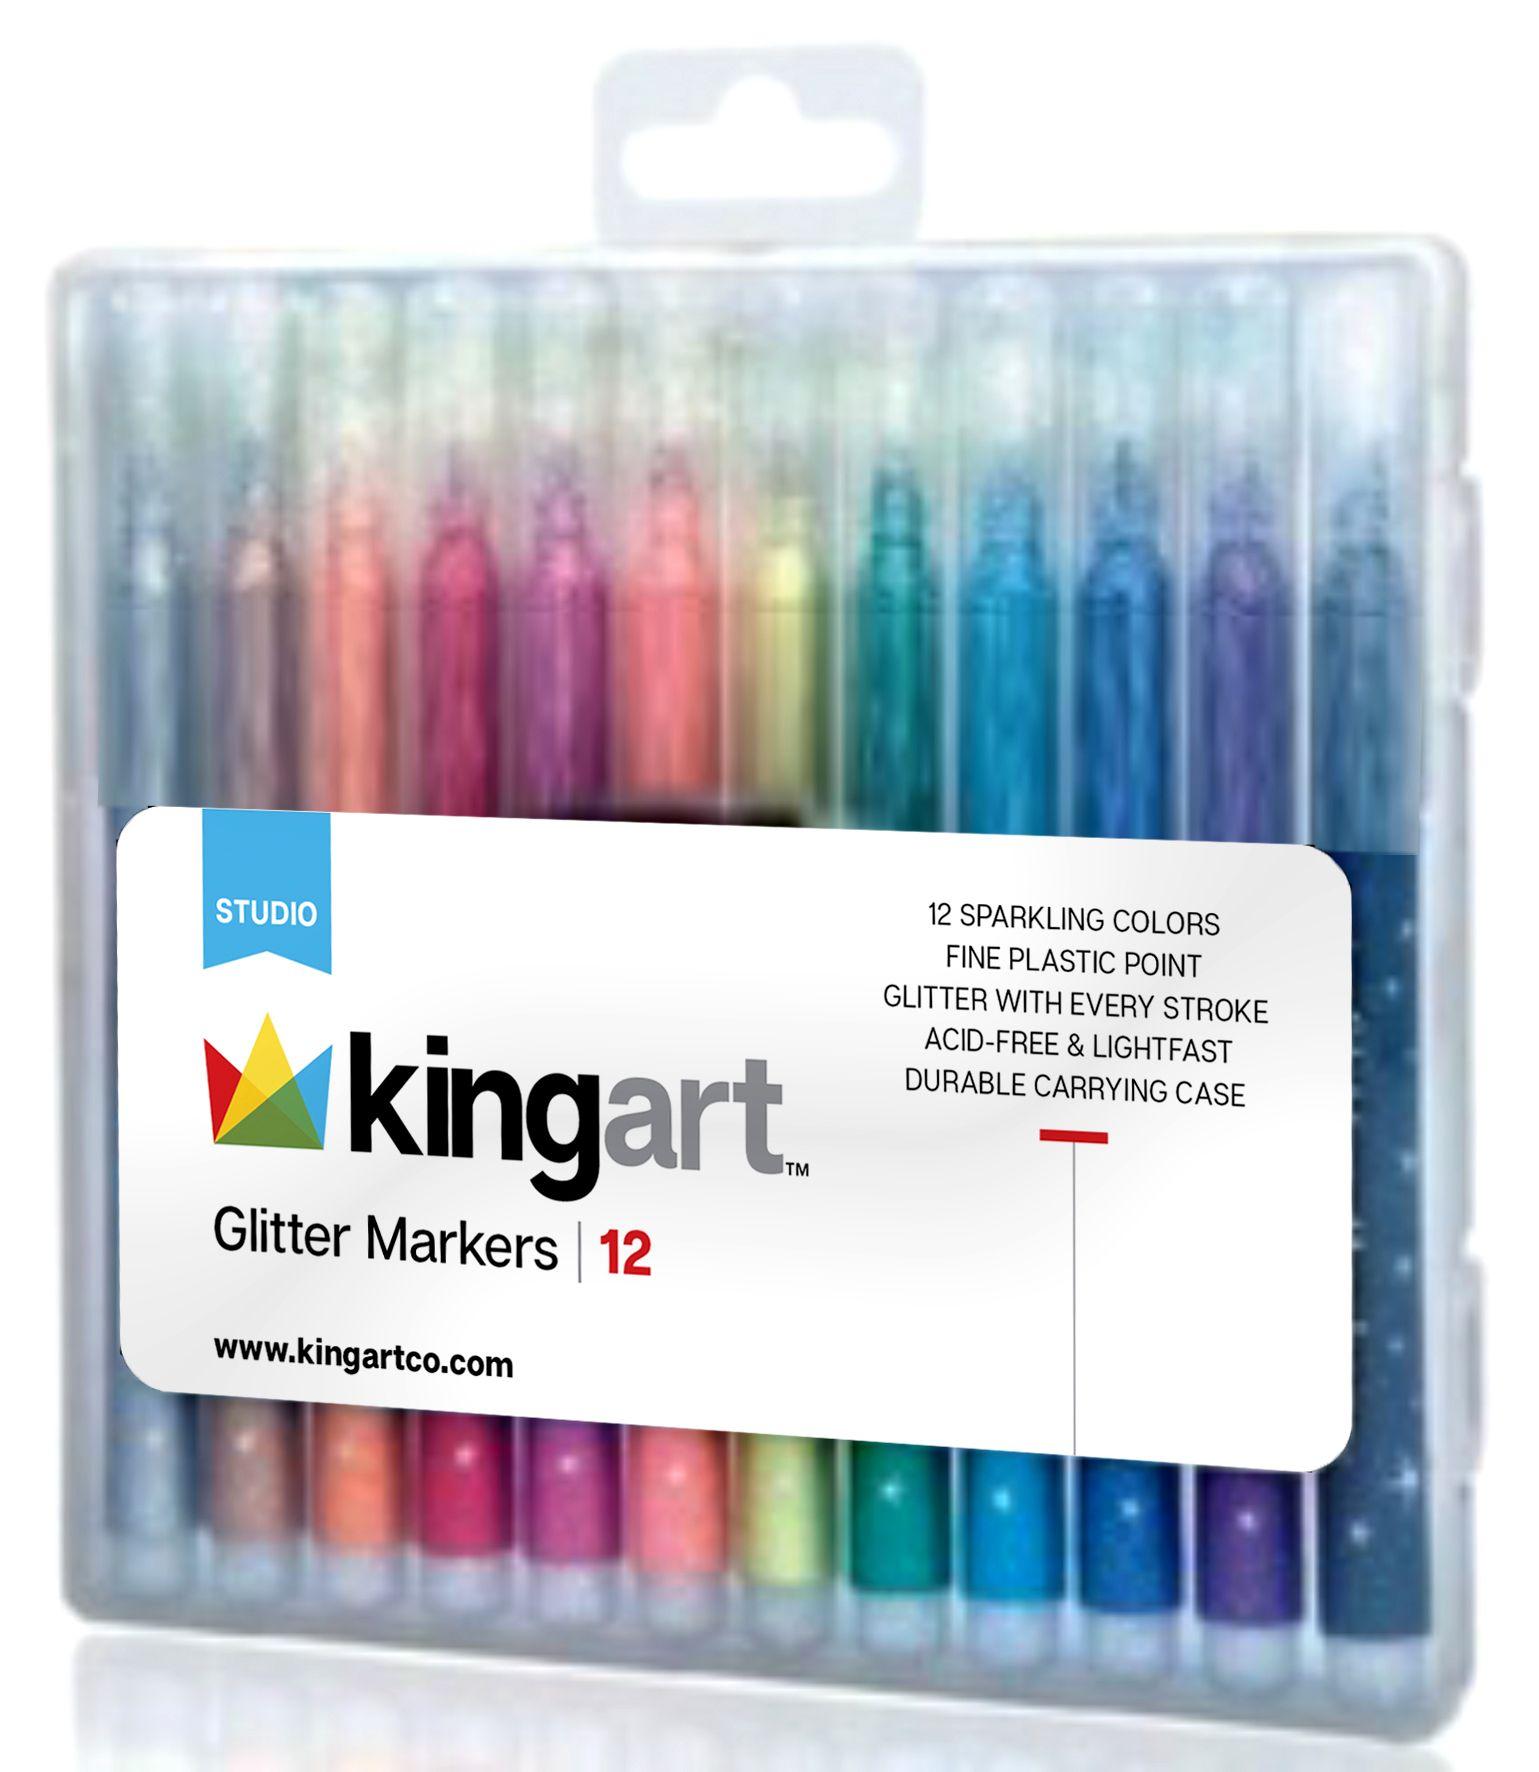 Kingart Glitter Markers Markers Glitter Pens Gel Pens